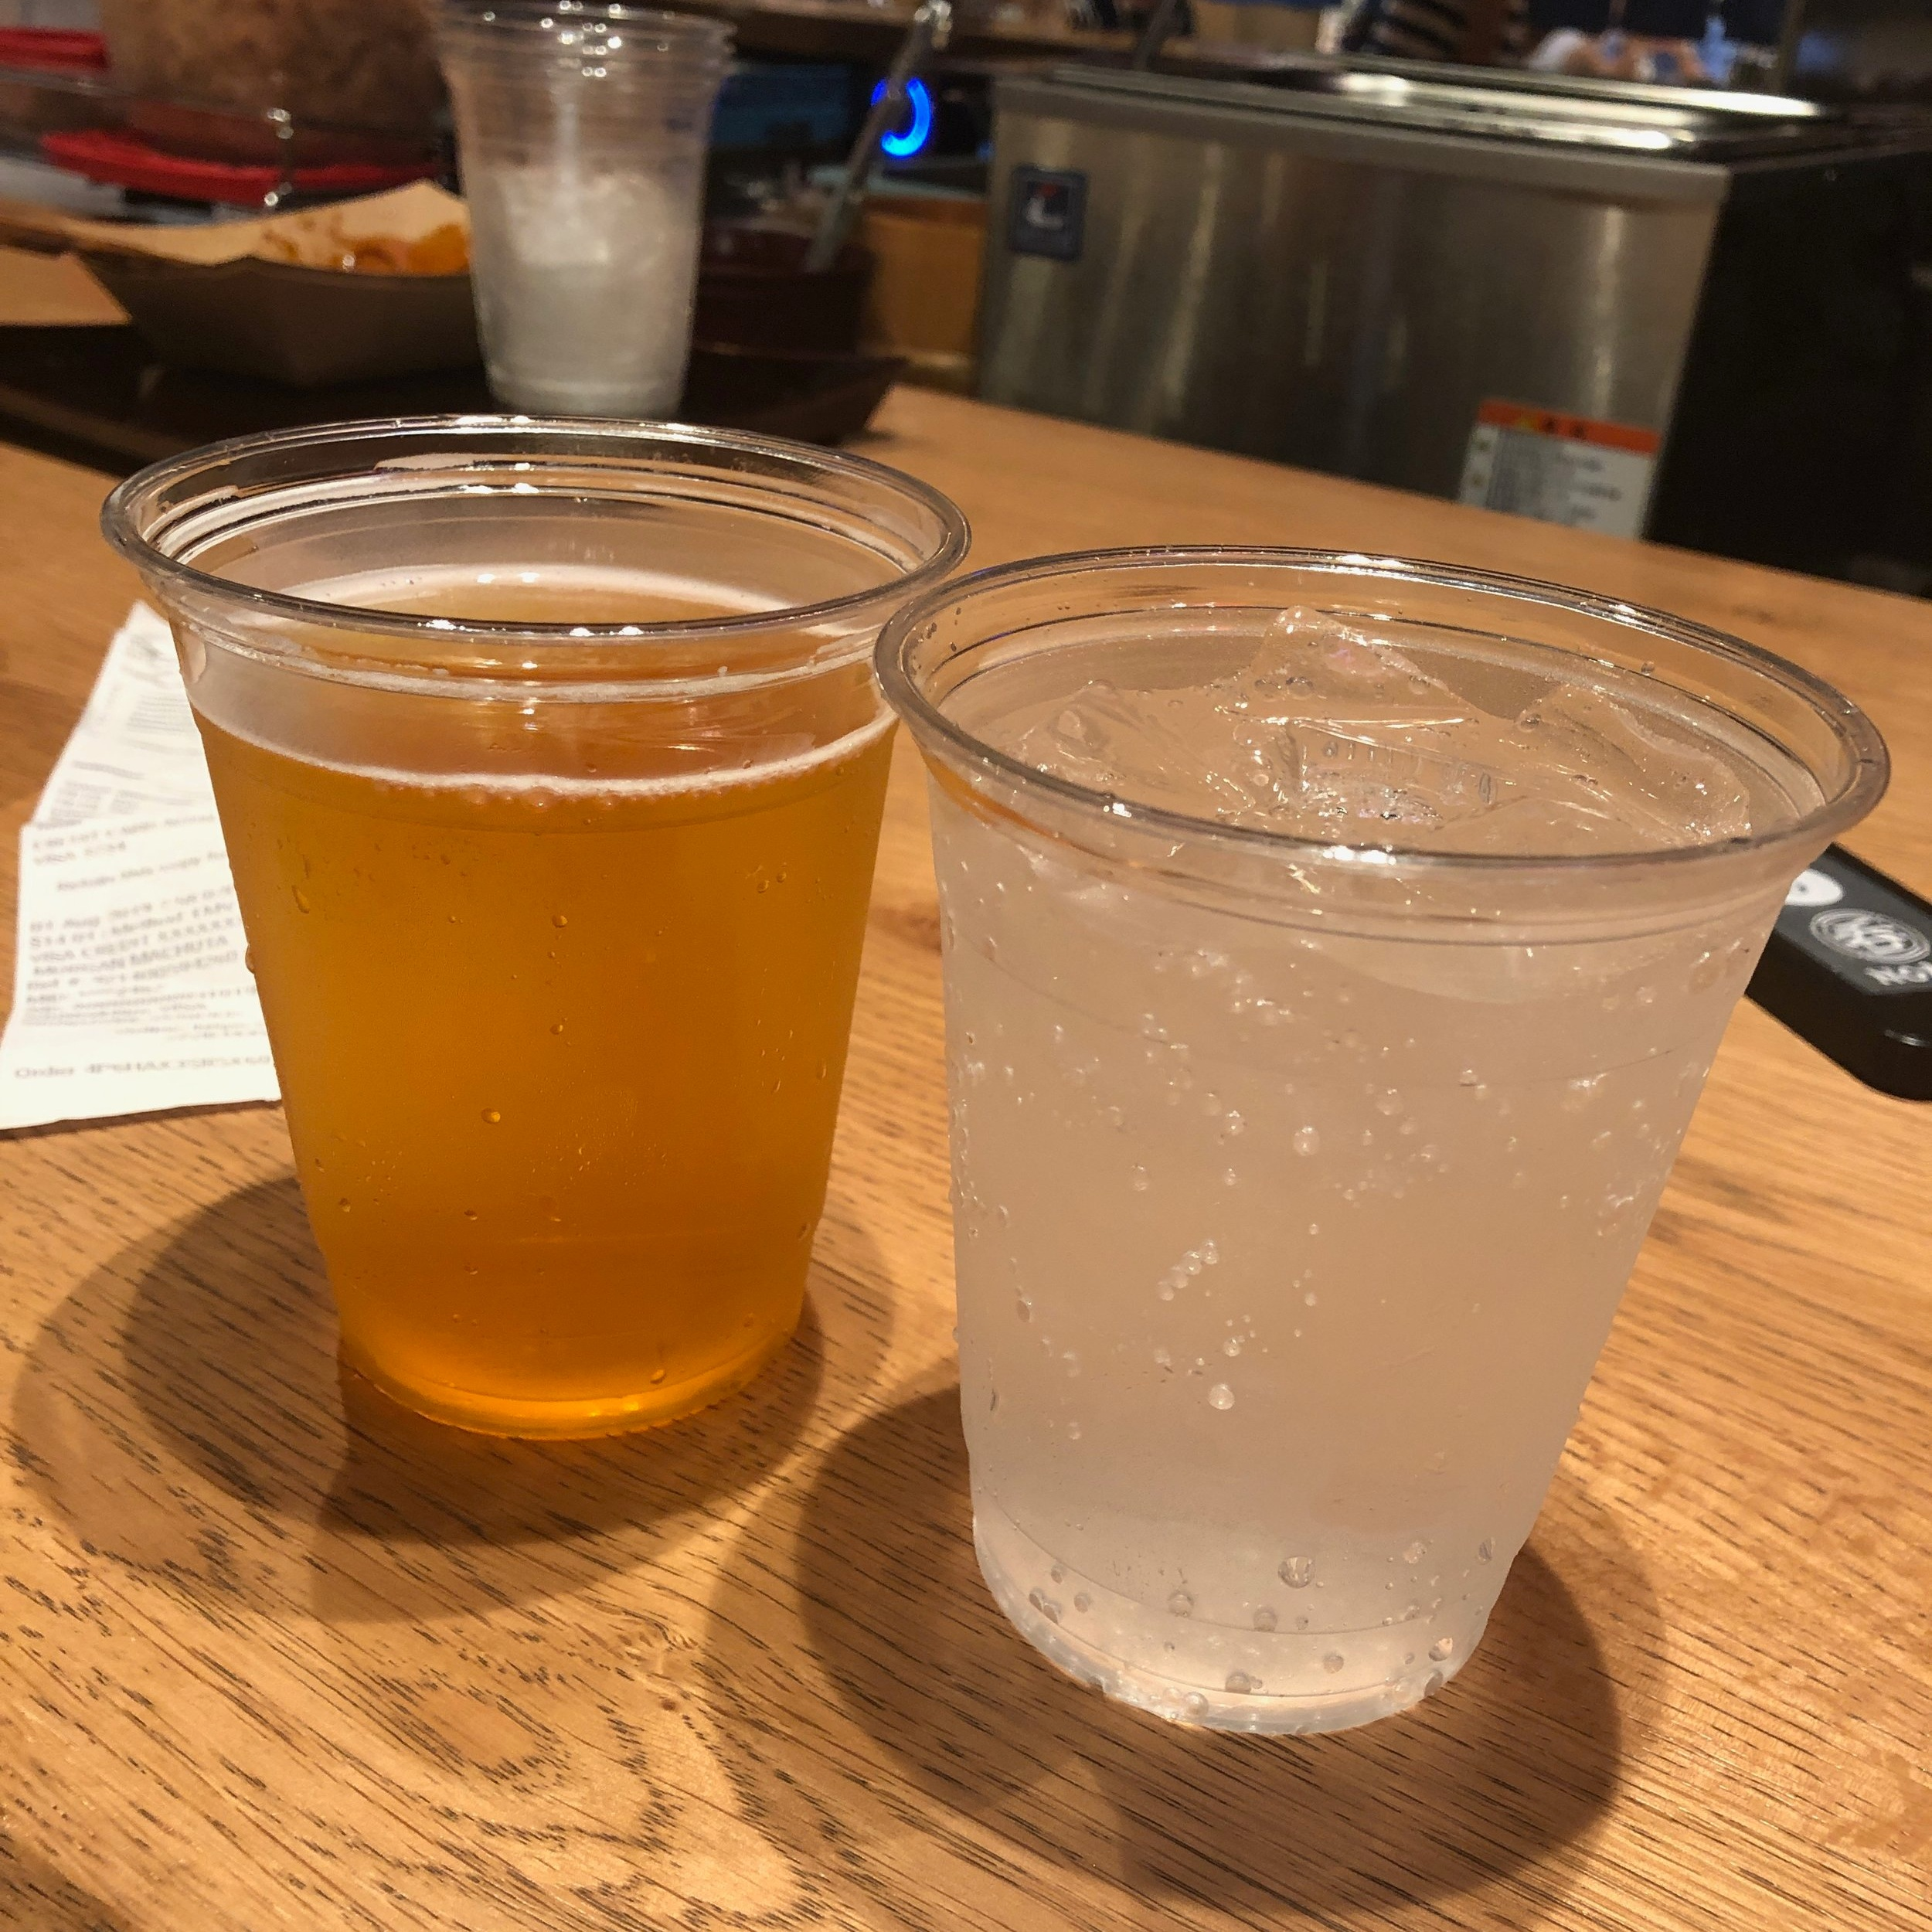 1 Cent Beers At Waikiki Yokocho: The Drinks